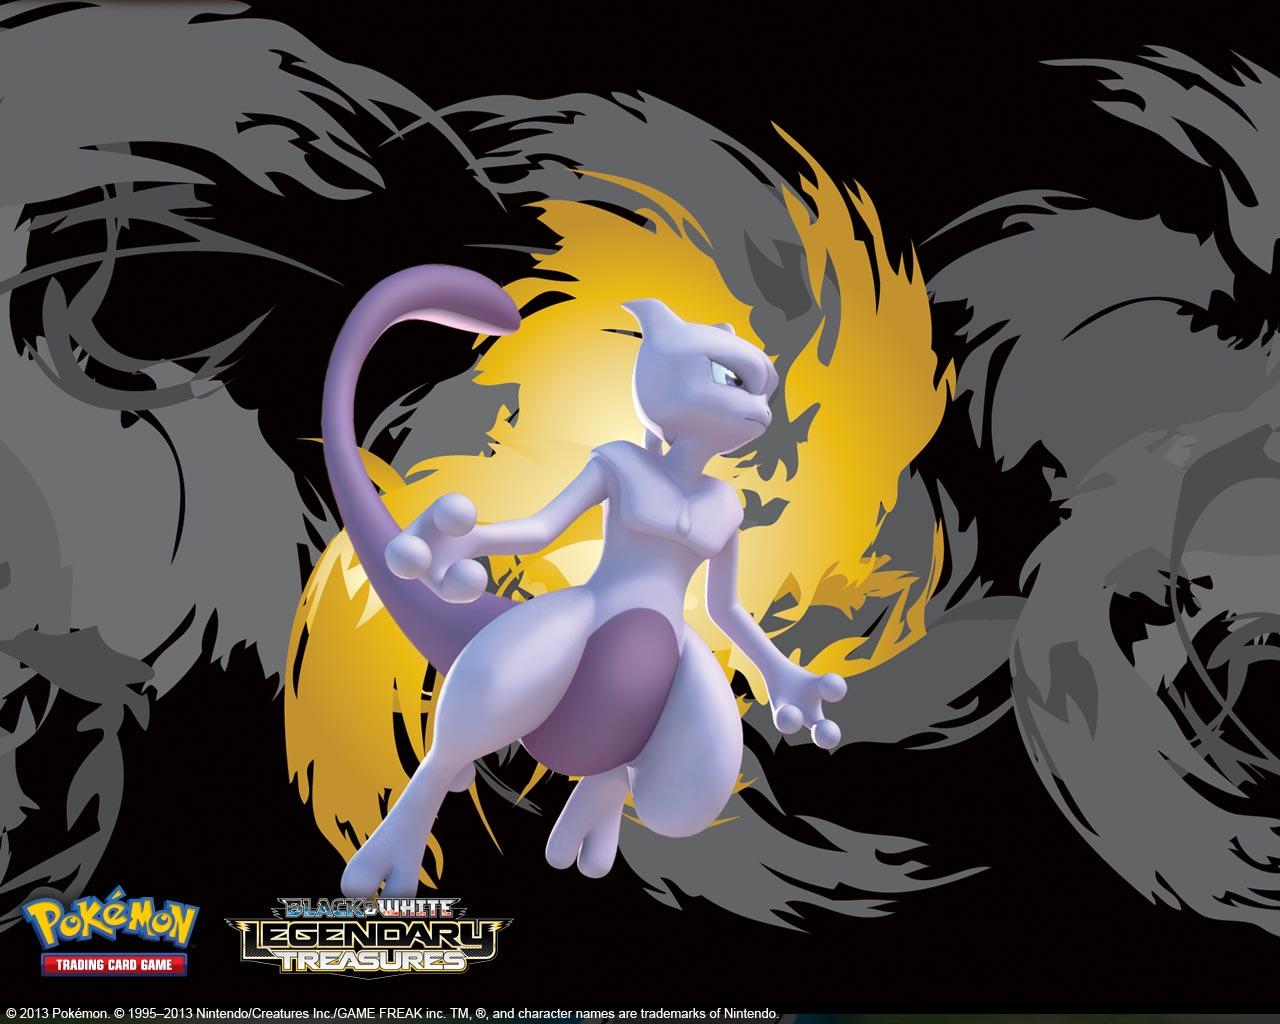 Pokemon tcg trading card game online